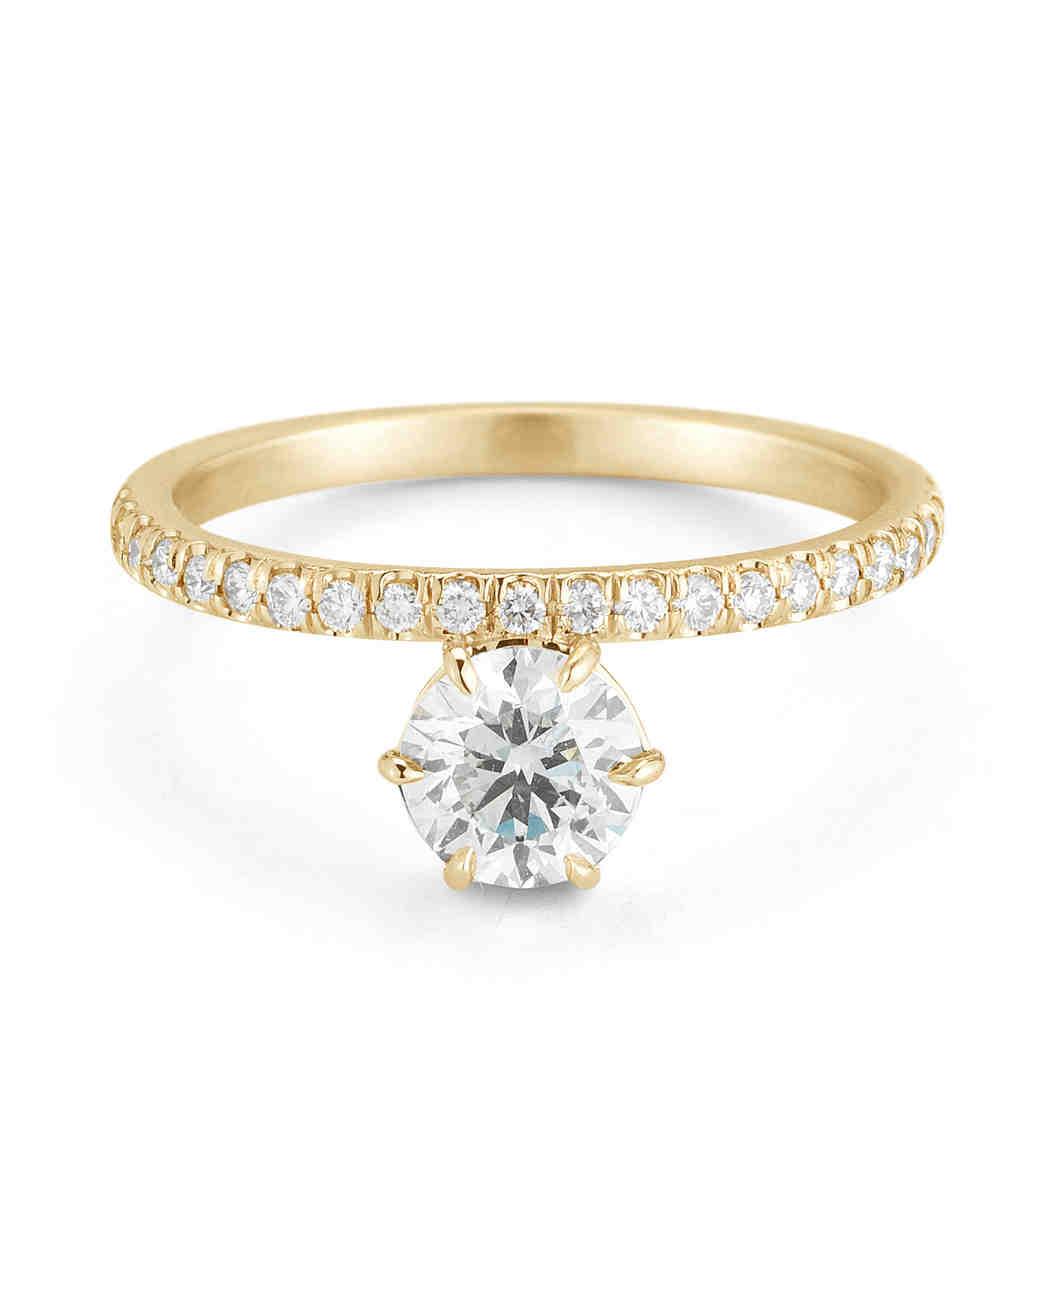 yellow gold engagement rings | martha stewart weddings zfcfgqt